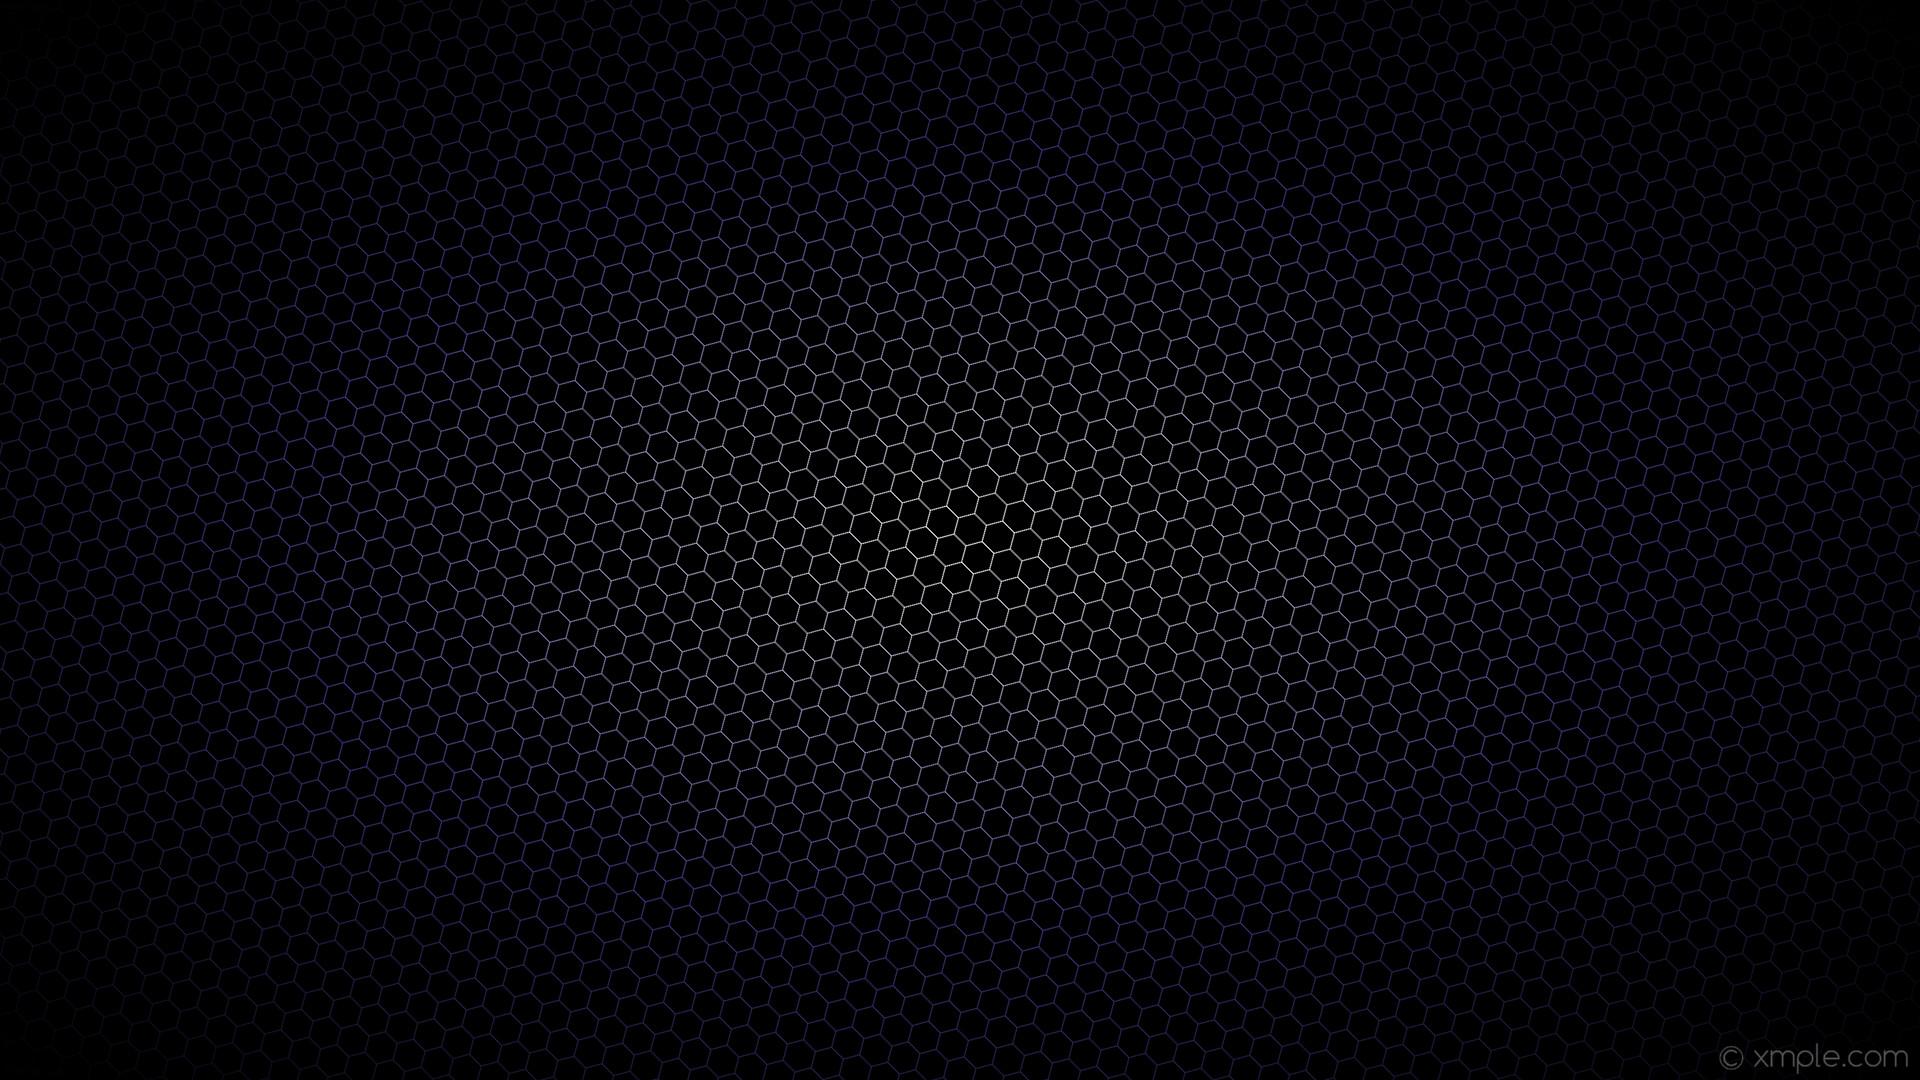 Black Gradient Wallpaper HD Wallpapers Download Free Images Wallpaper [1000image.com]